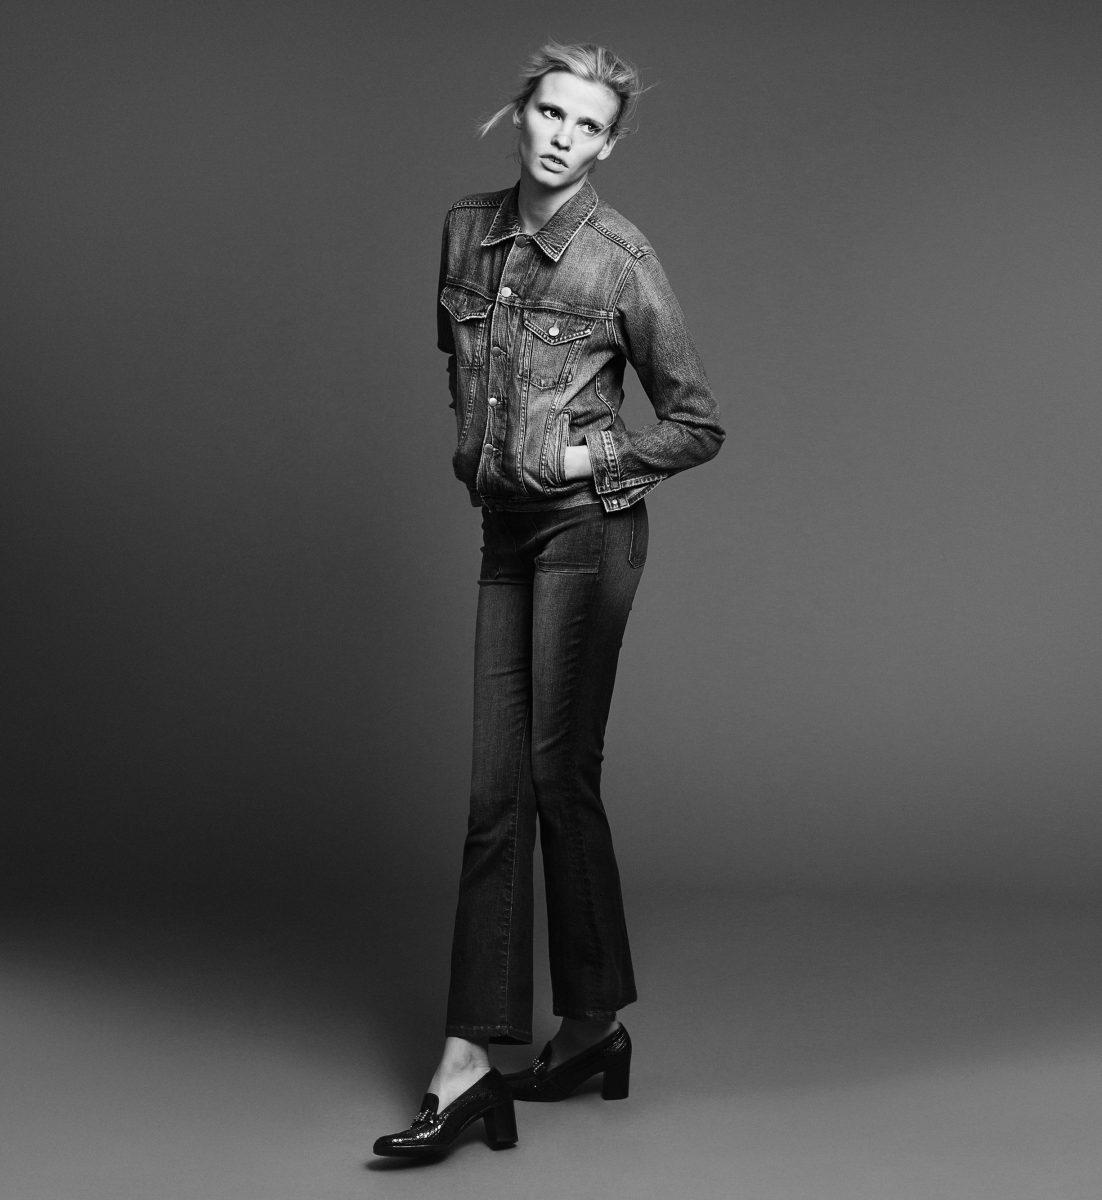 Erik Torstensson & Jens Grede: Fashion's Polymaths